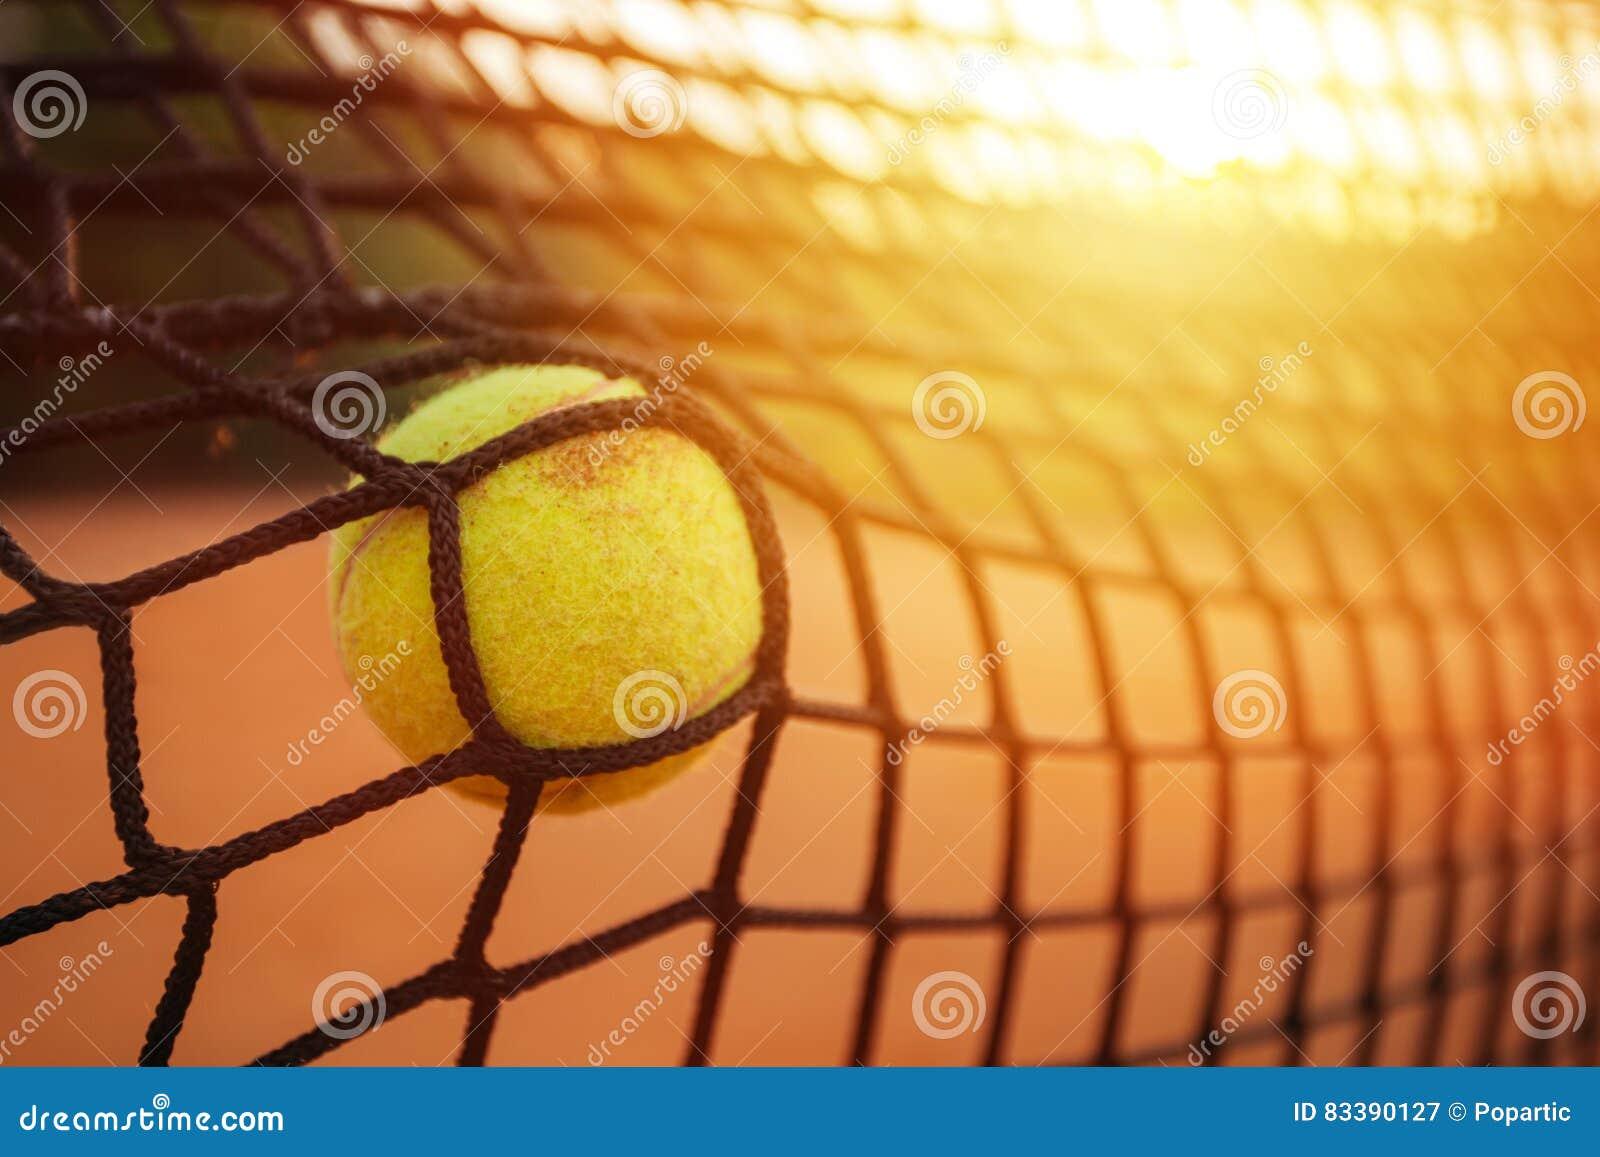 Tennisball im Tennisnetz stockbild. Bild von hell